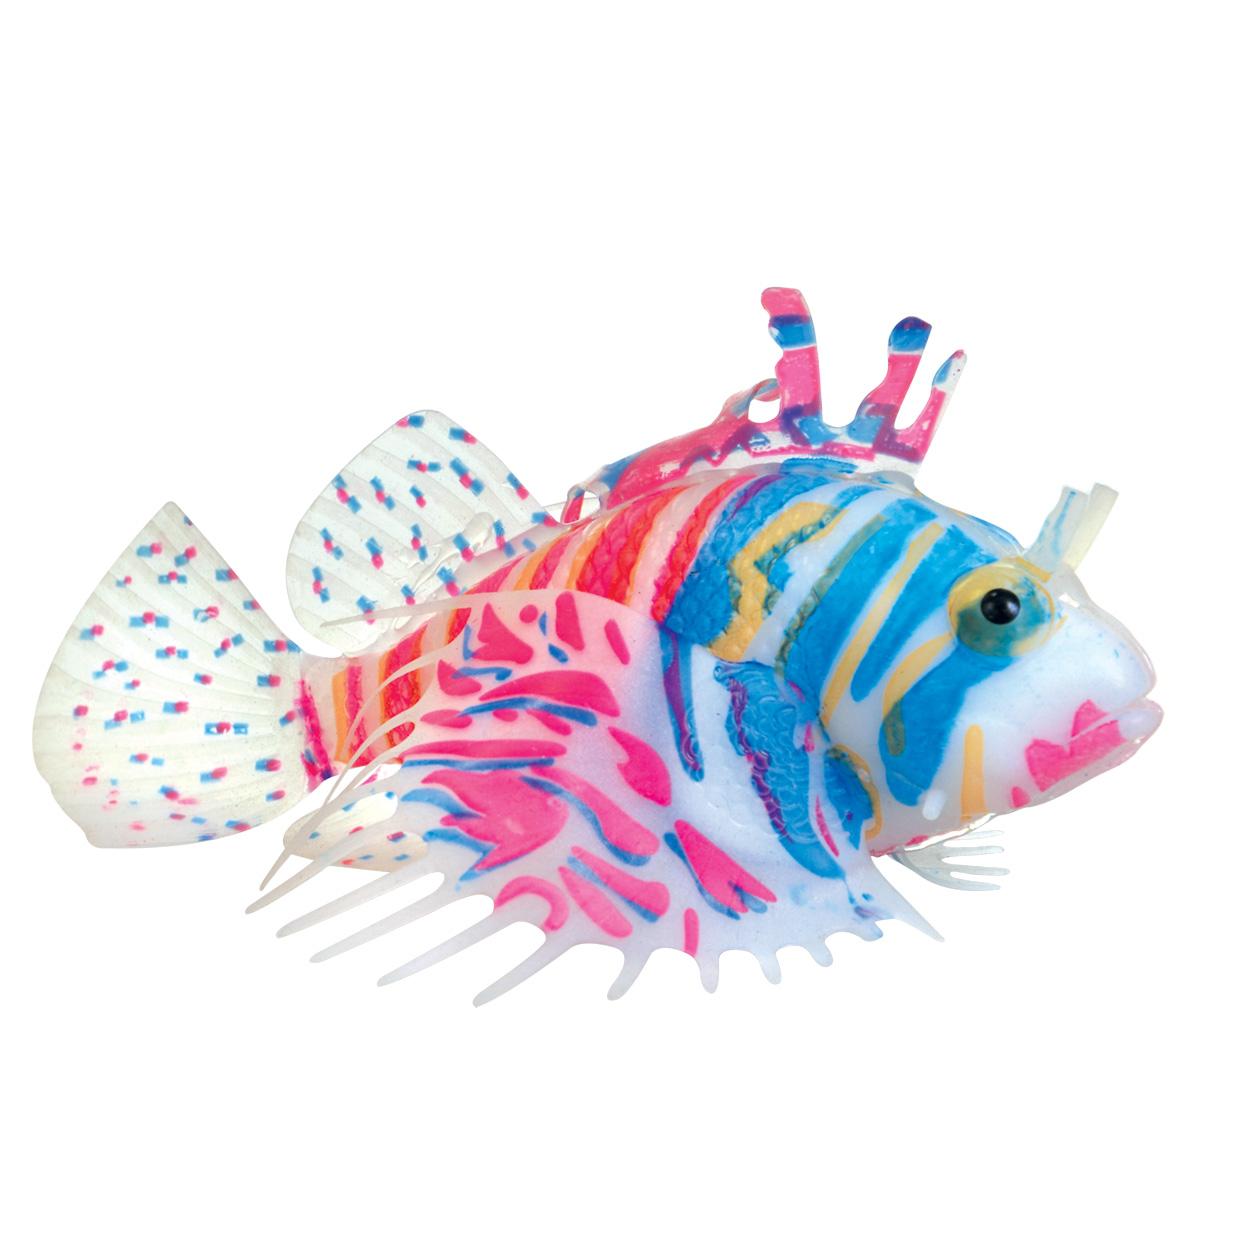 Underwater Treasures Action Lionfish - Multicolored 53585